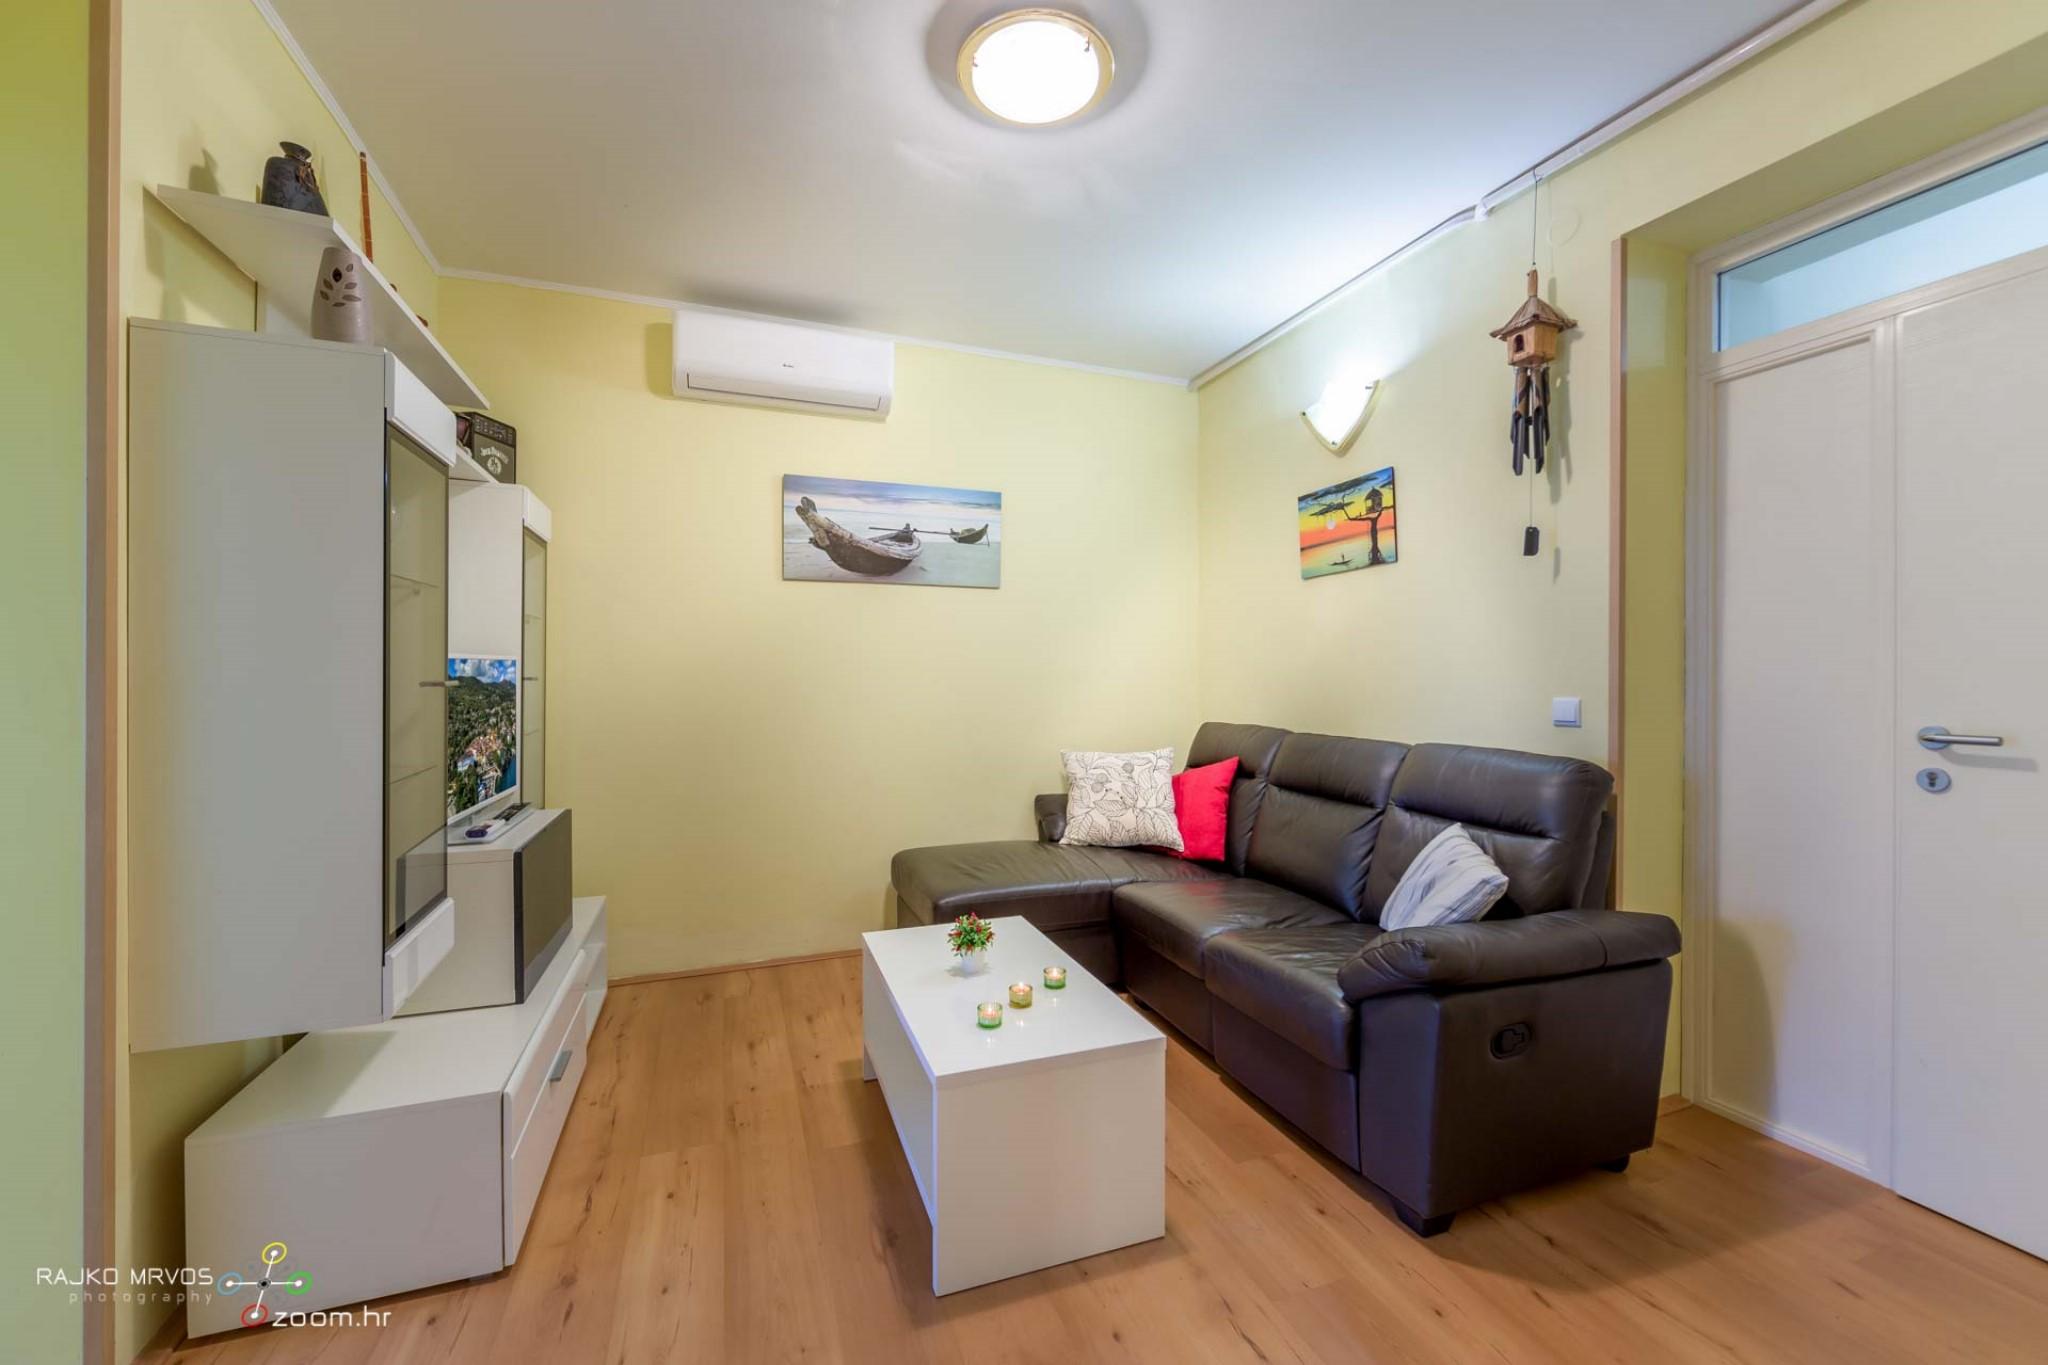 fotografiranje-interijera-fotograf-eksterijera-vila-apartmana-kuca-apartmani-Dujmic-18